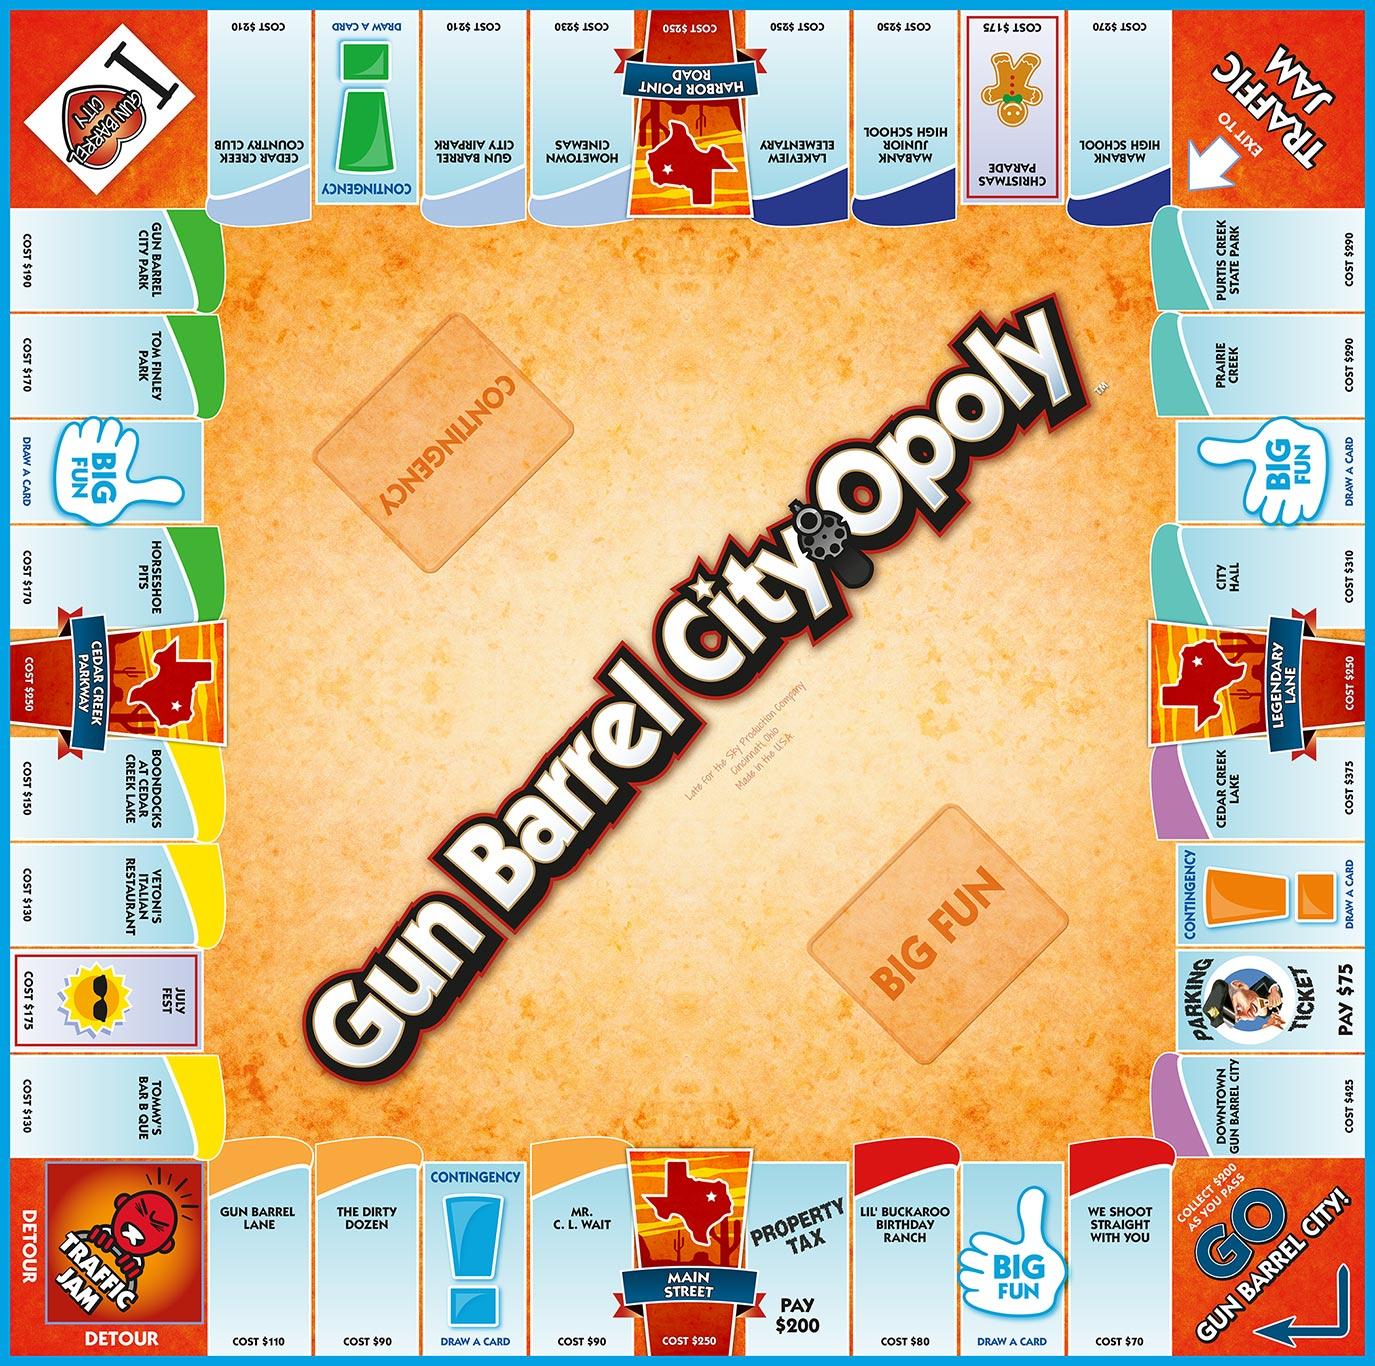 GUN BARREL-OPOLY Board Game